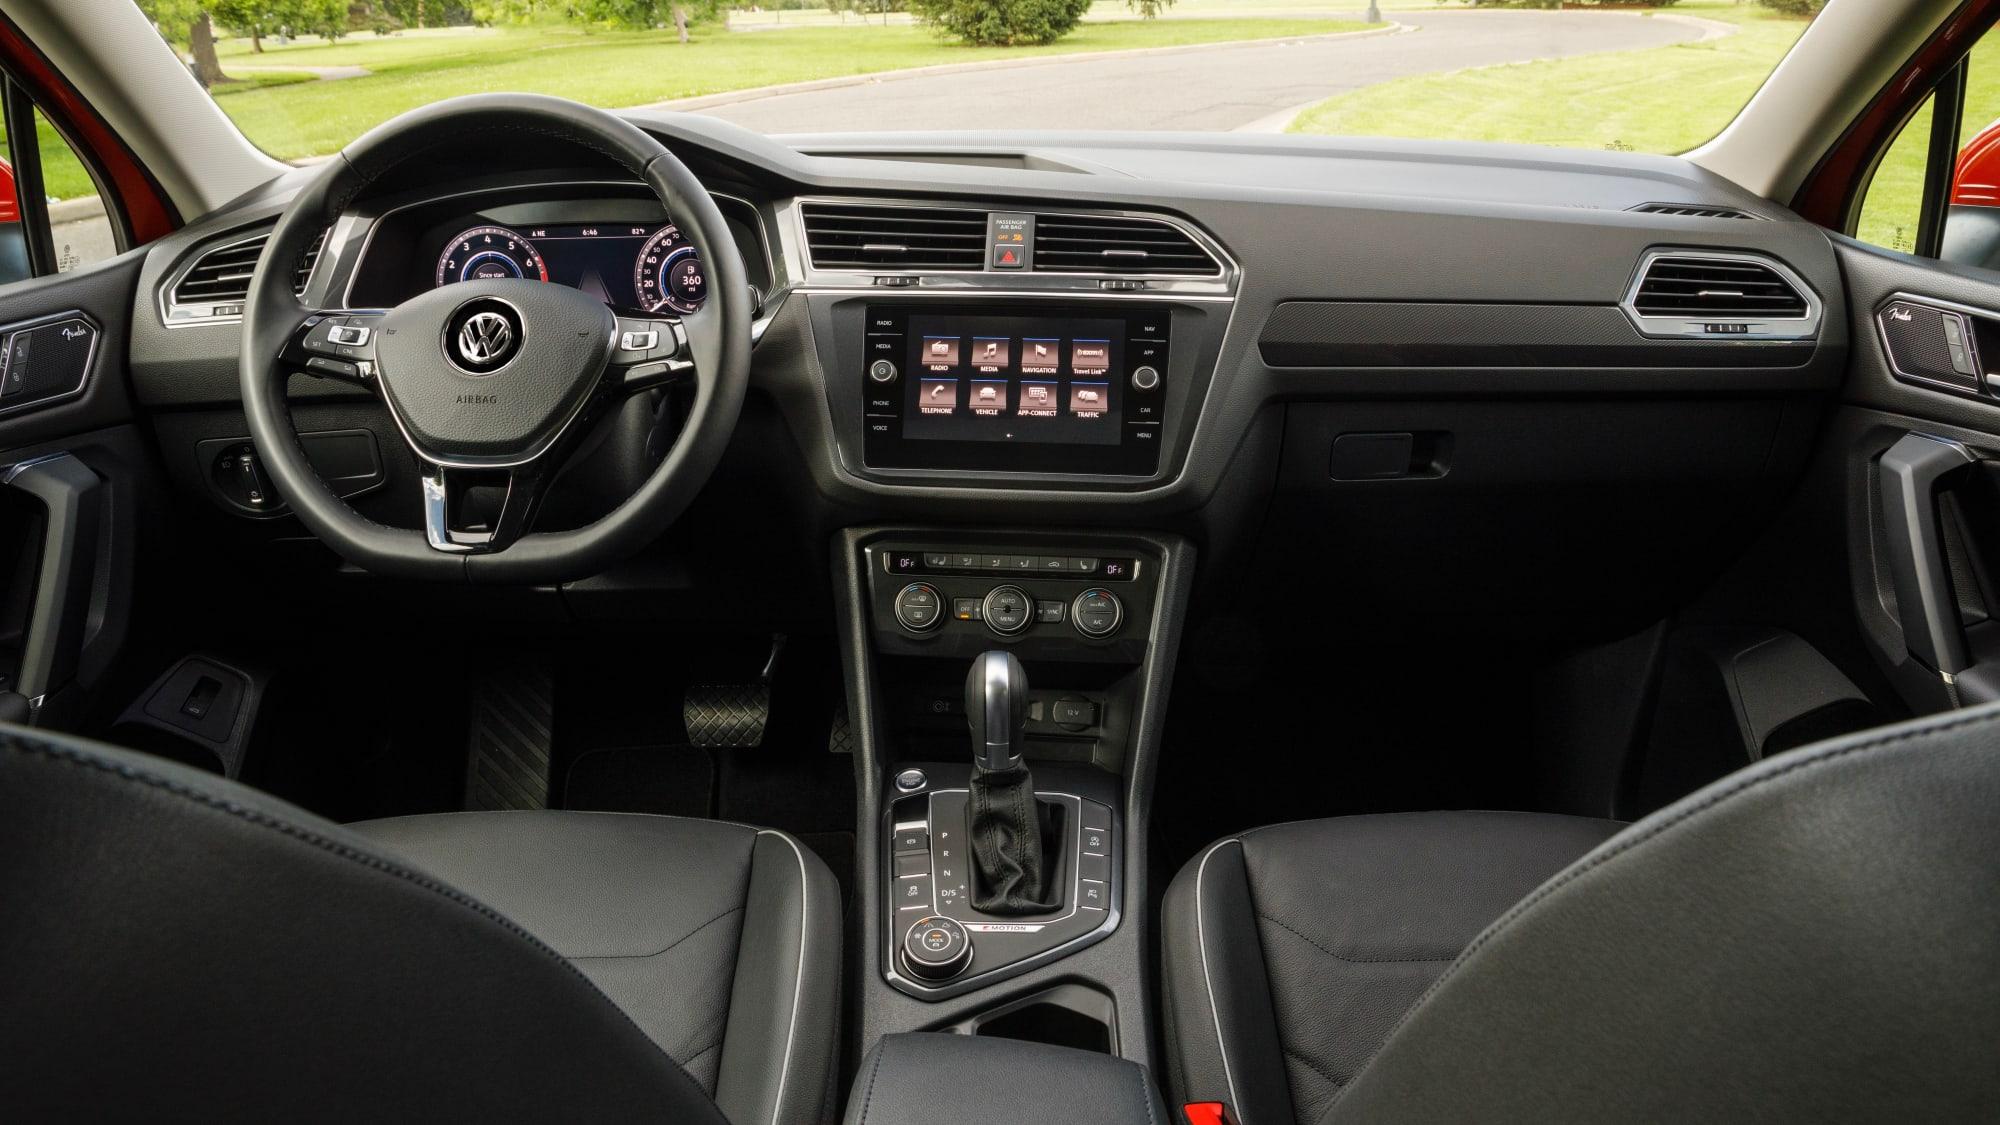 2019 Volkswagen Tiguan Overview, Interior & Exterior >> 2019 Vw Tiguan Reviews Price Specs Features And Photos